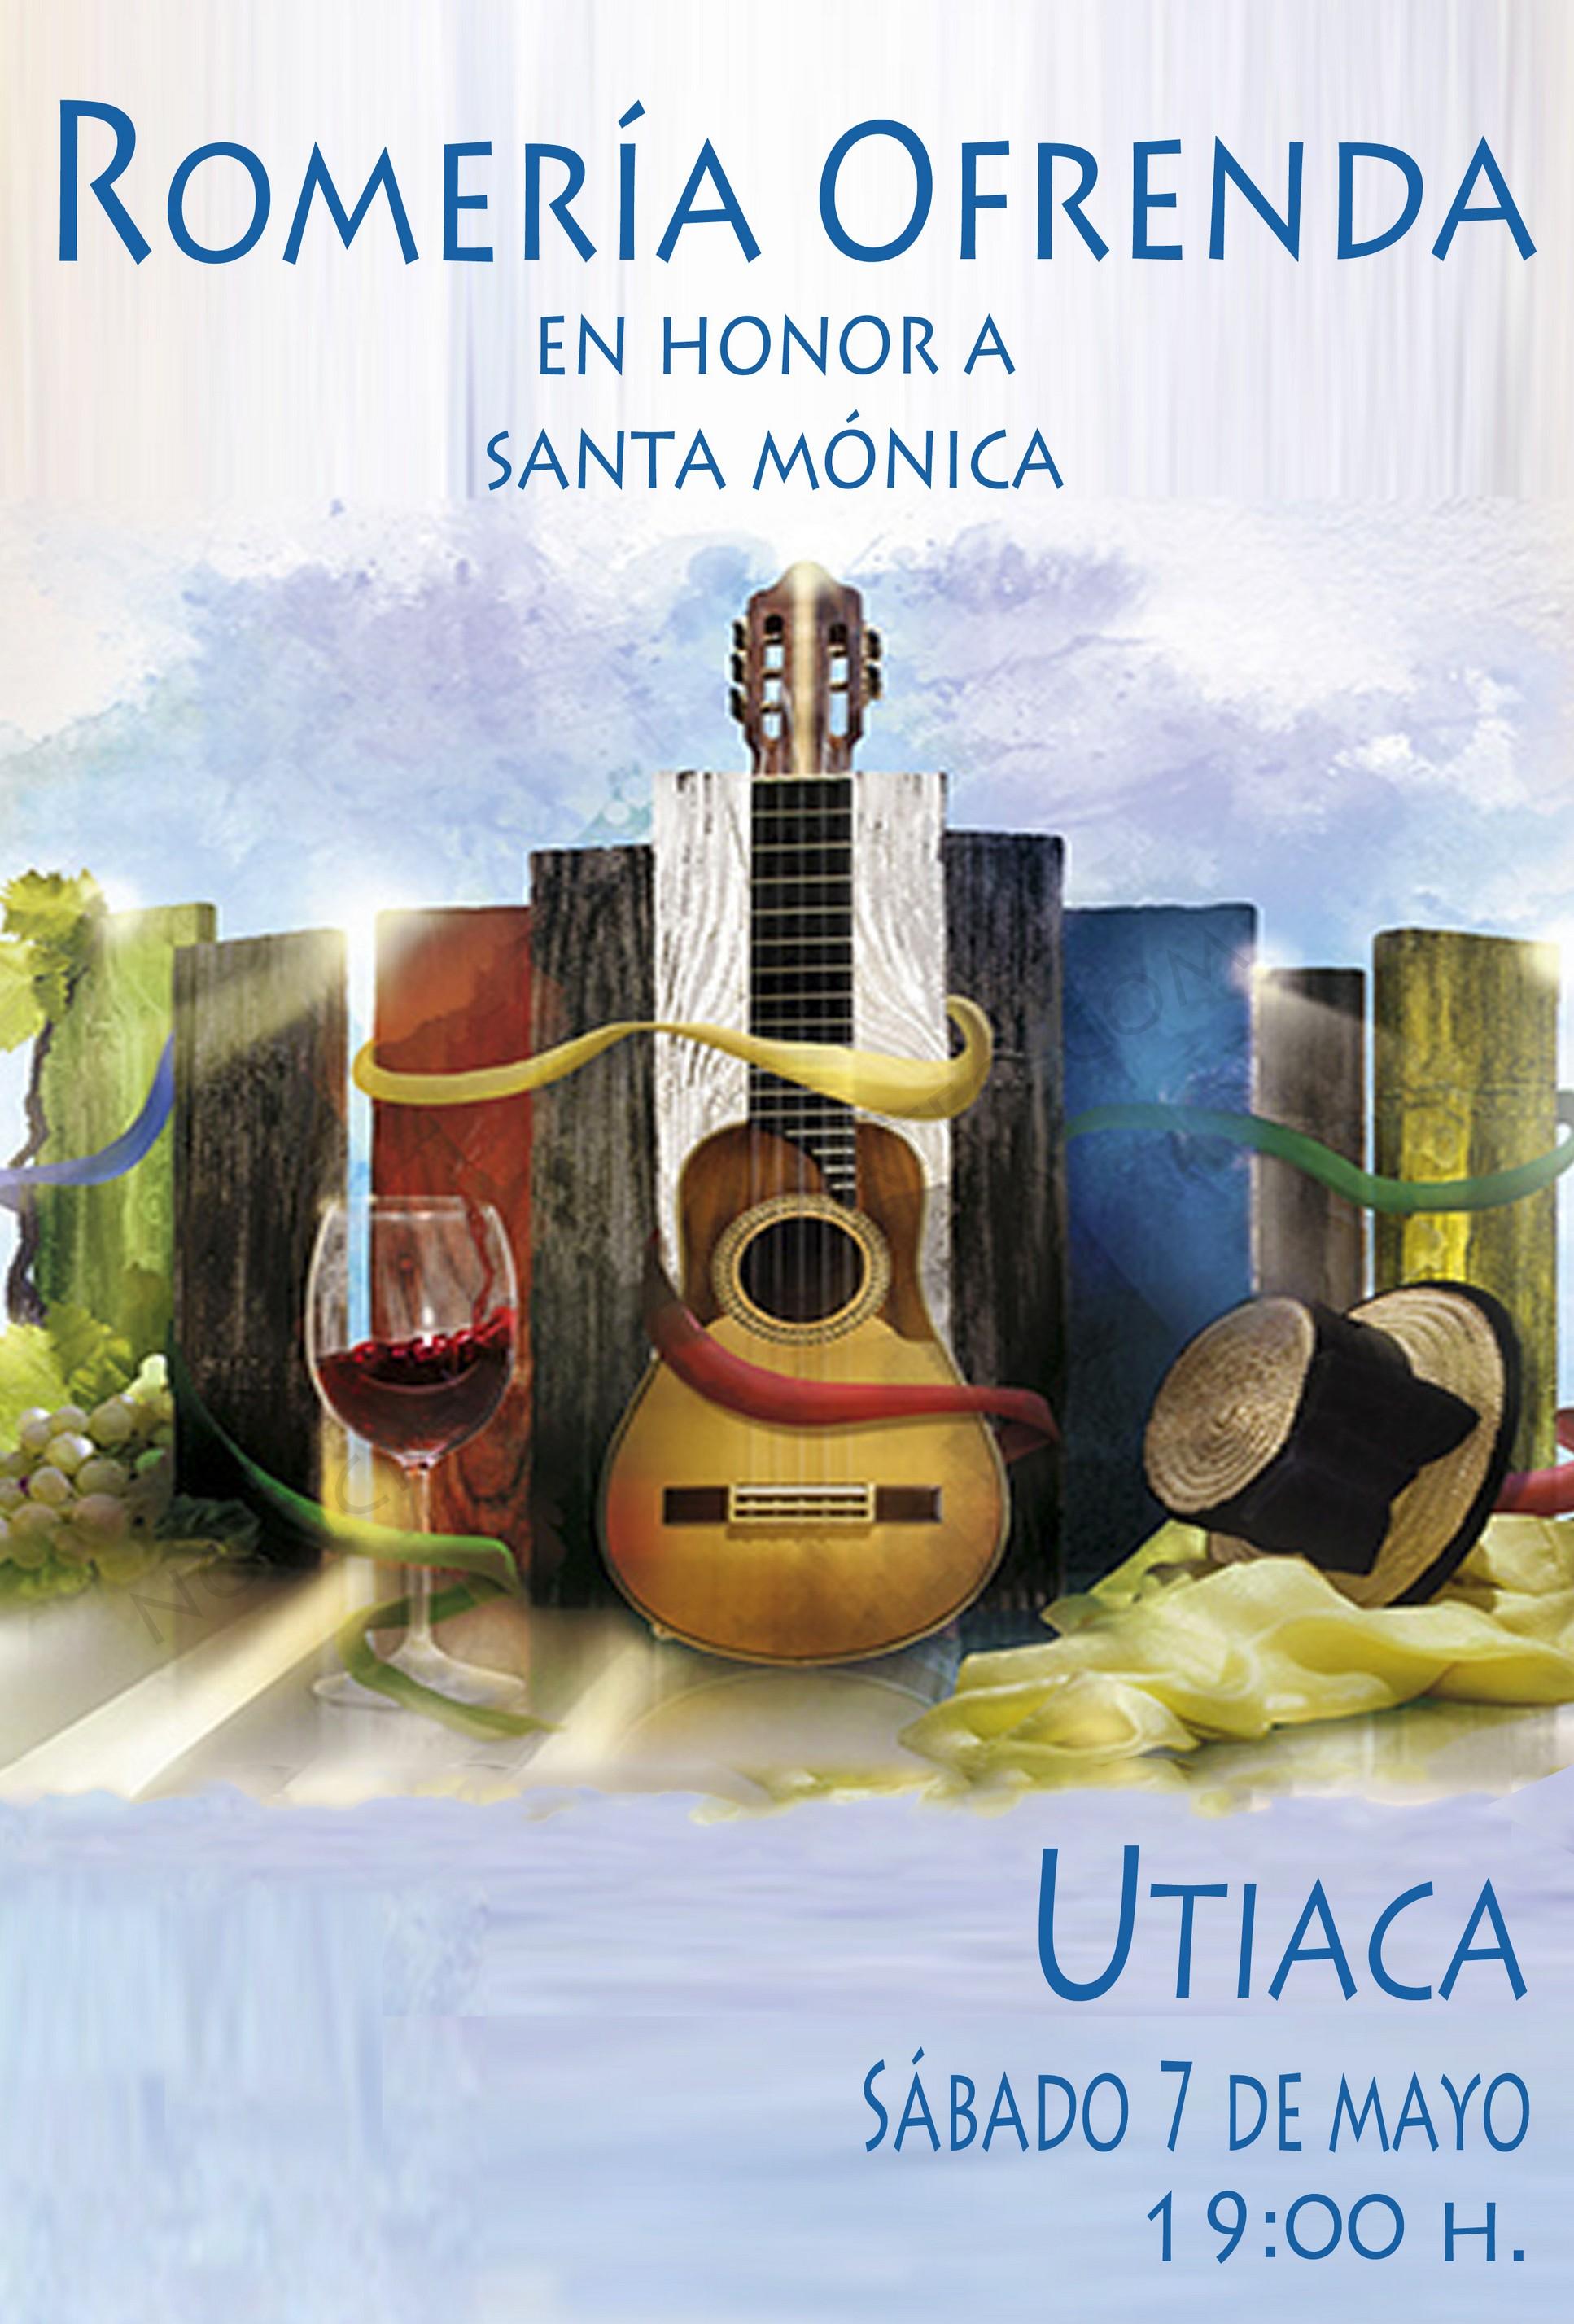 Romeria Utiaca San Mateo 2016 Laura Miranda Noticias de San Mateo